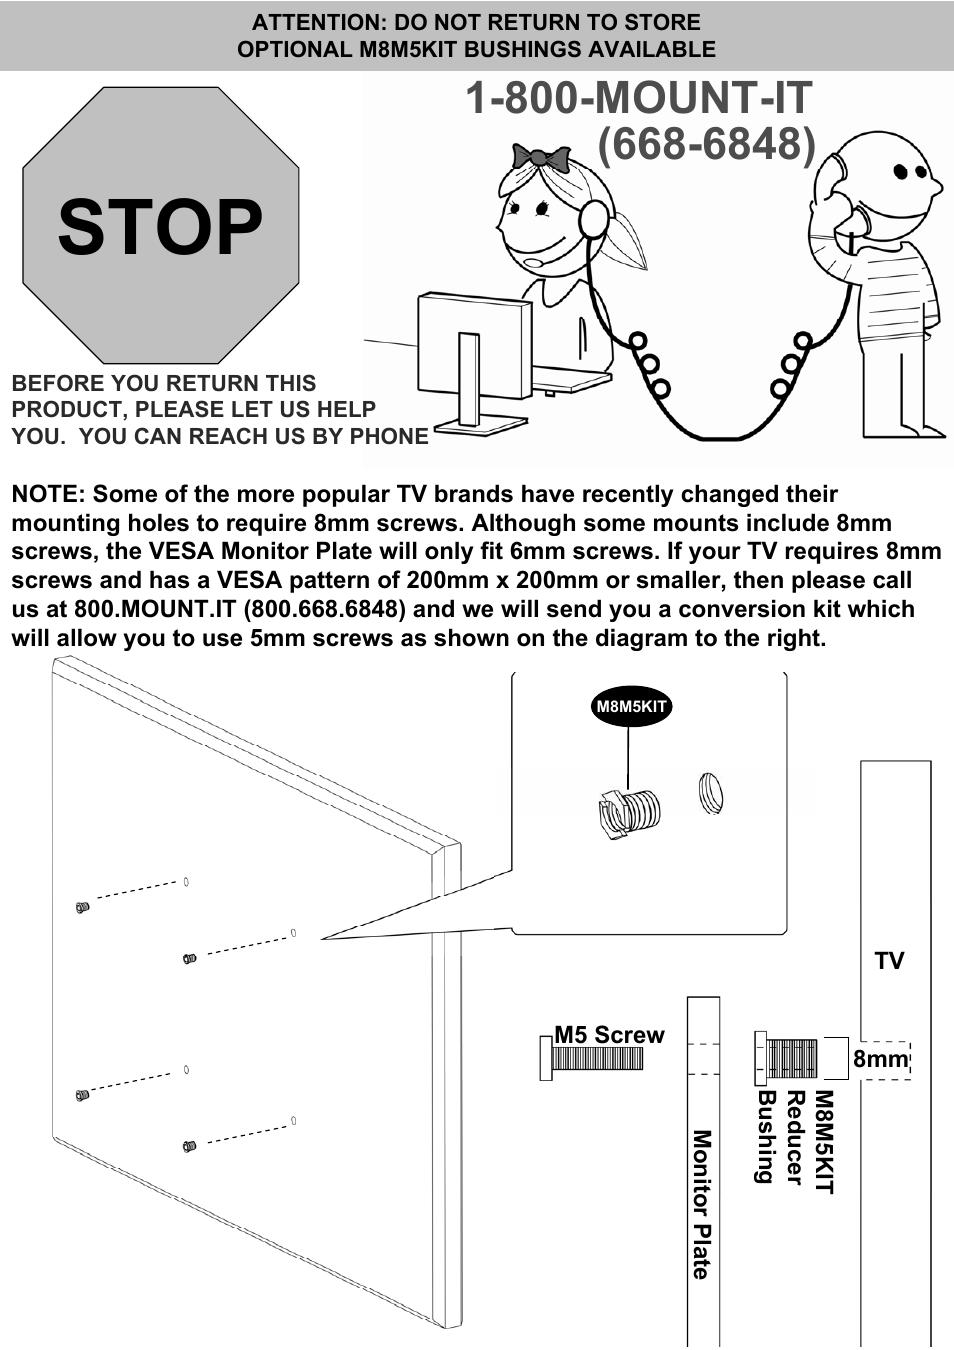 stop omnimount 4n1 s manual ru user manual page 11 20 rh manualsdir com